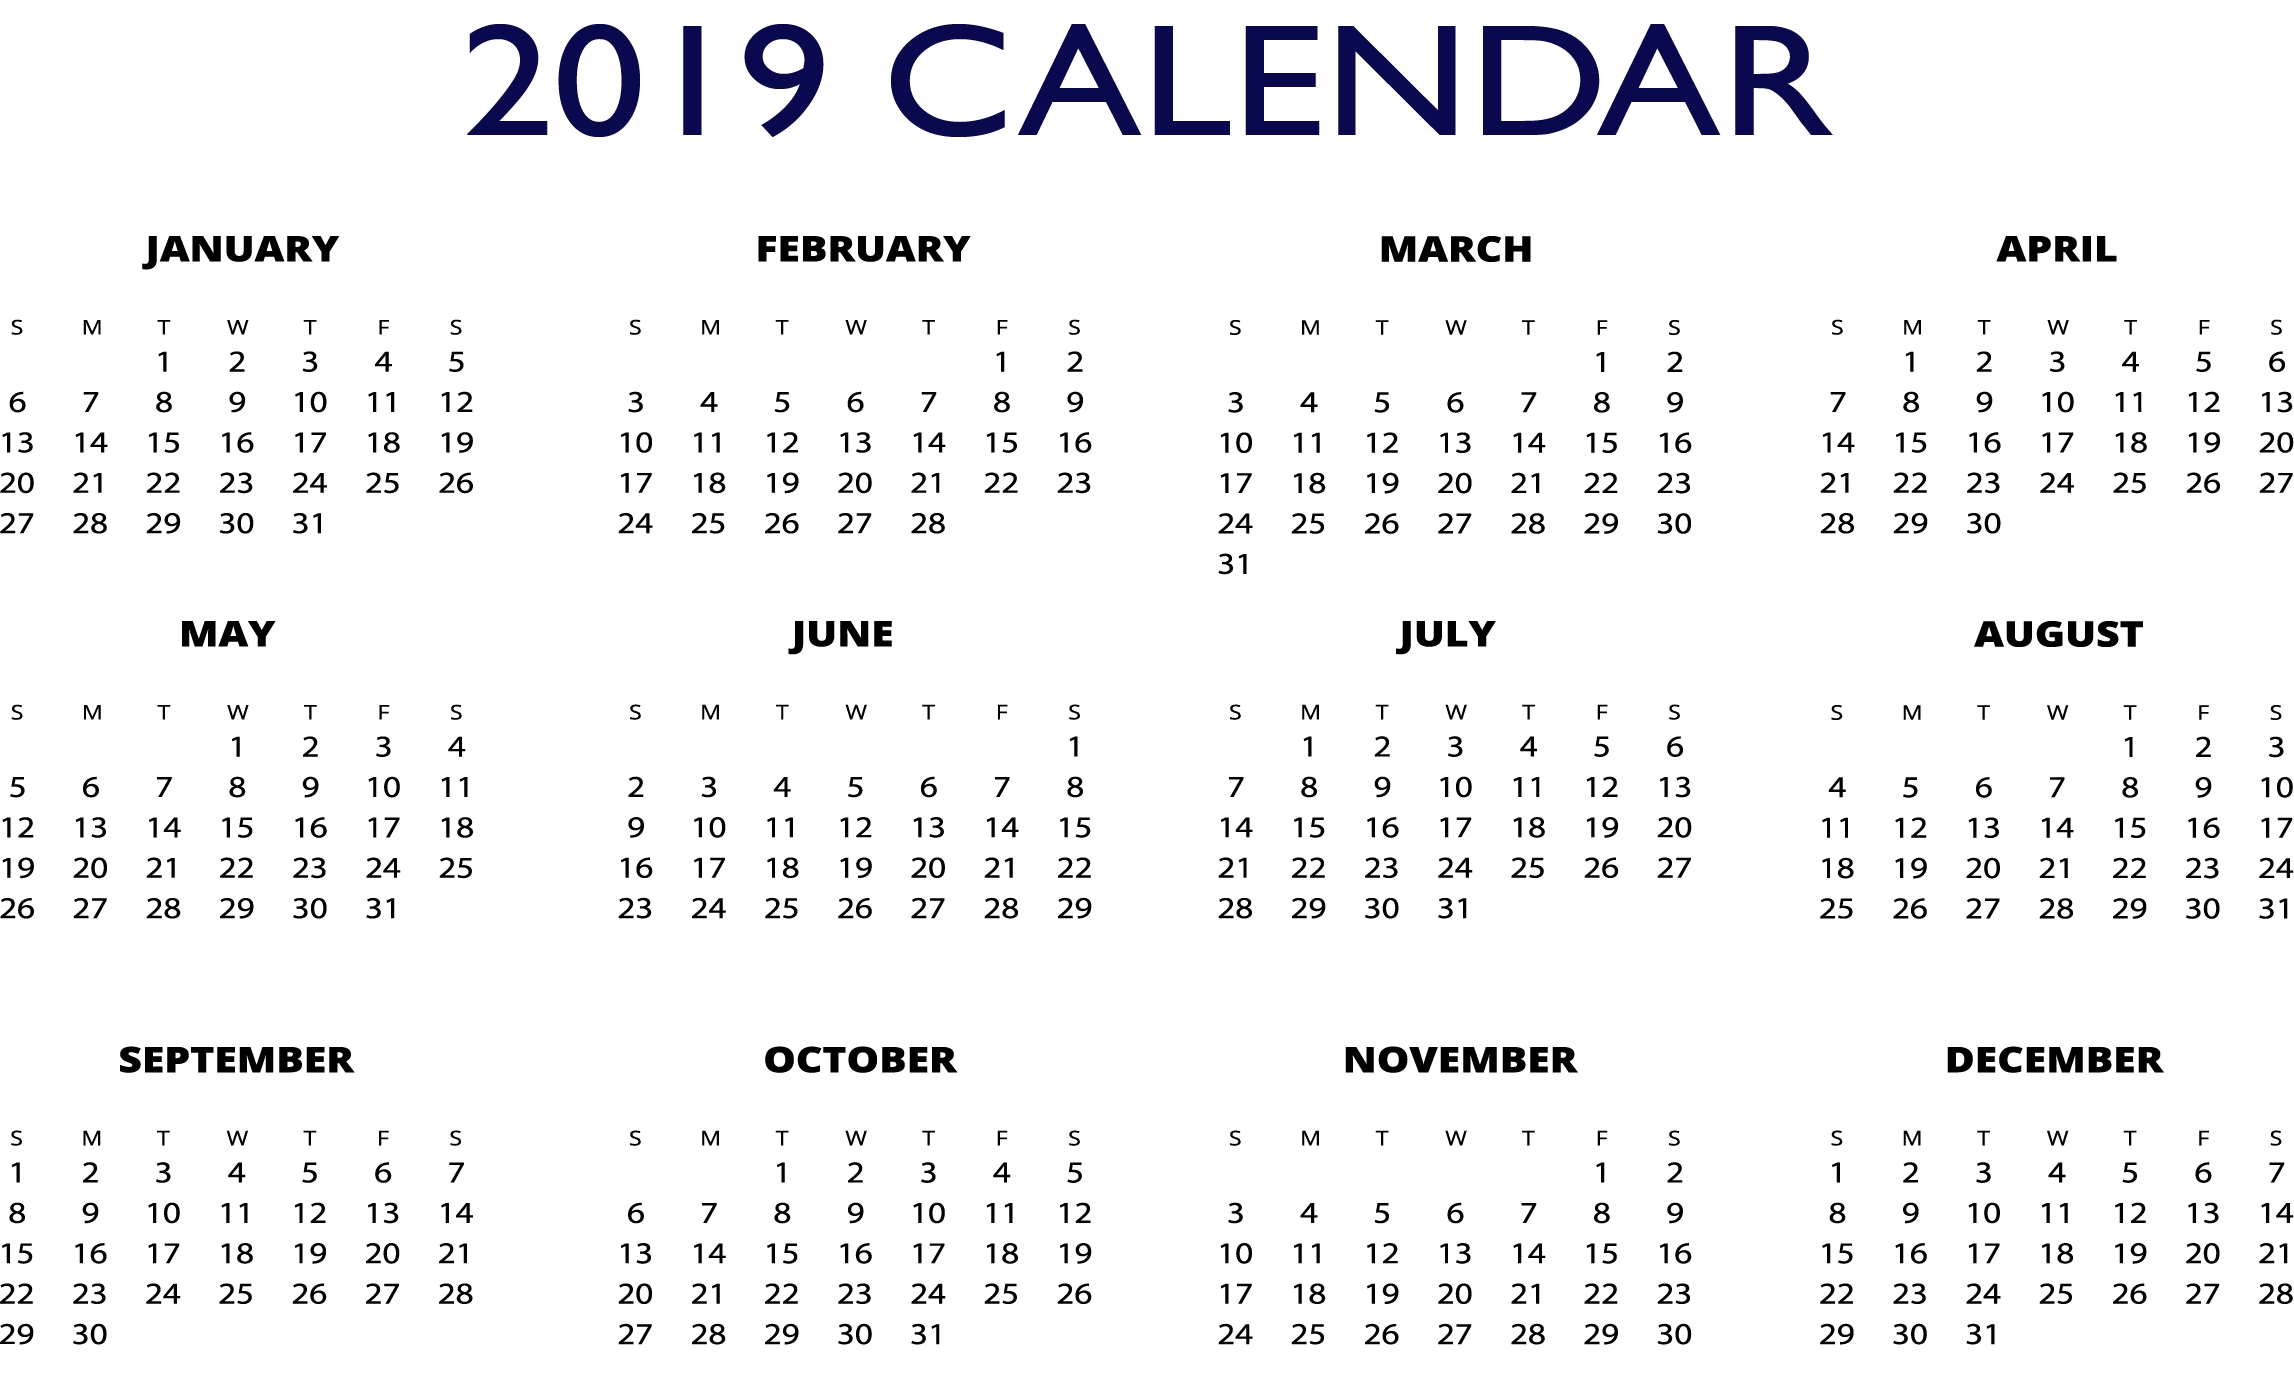 2019 Excel One Page Calendar | 2019 Calendars | Pinterest | Calendar Calendar 2019 Excel